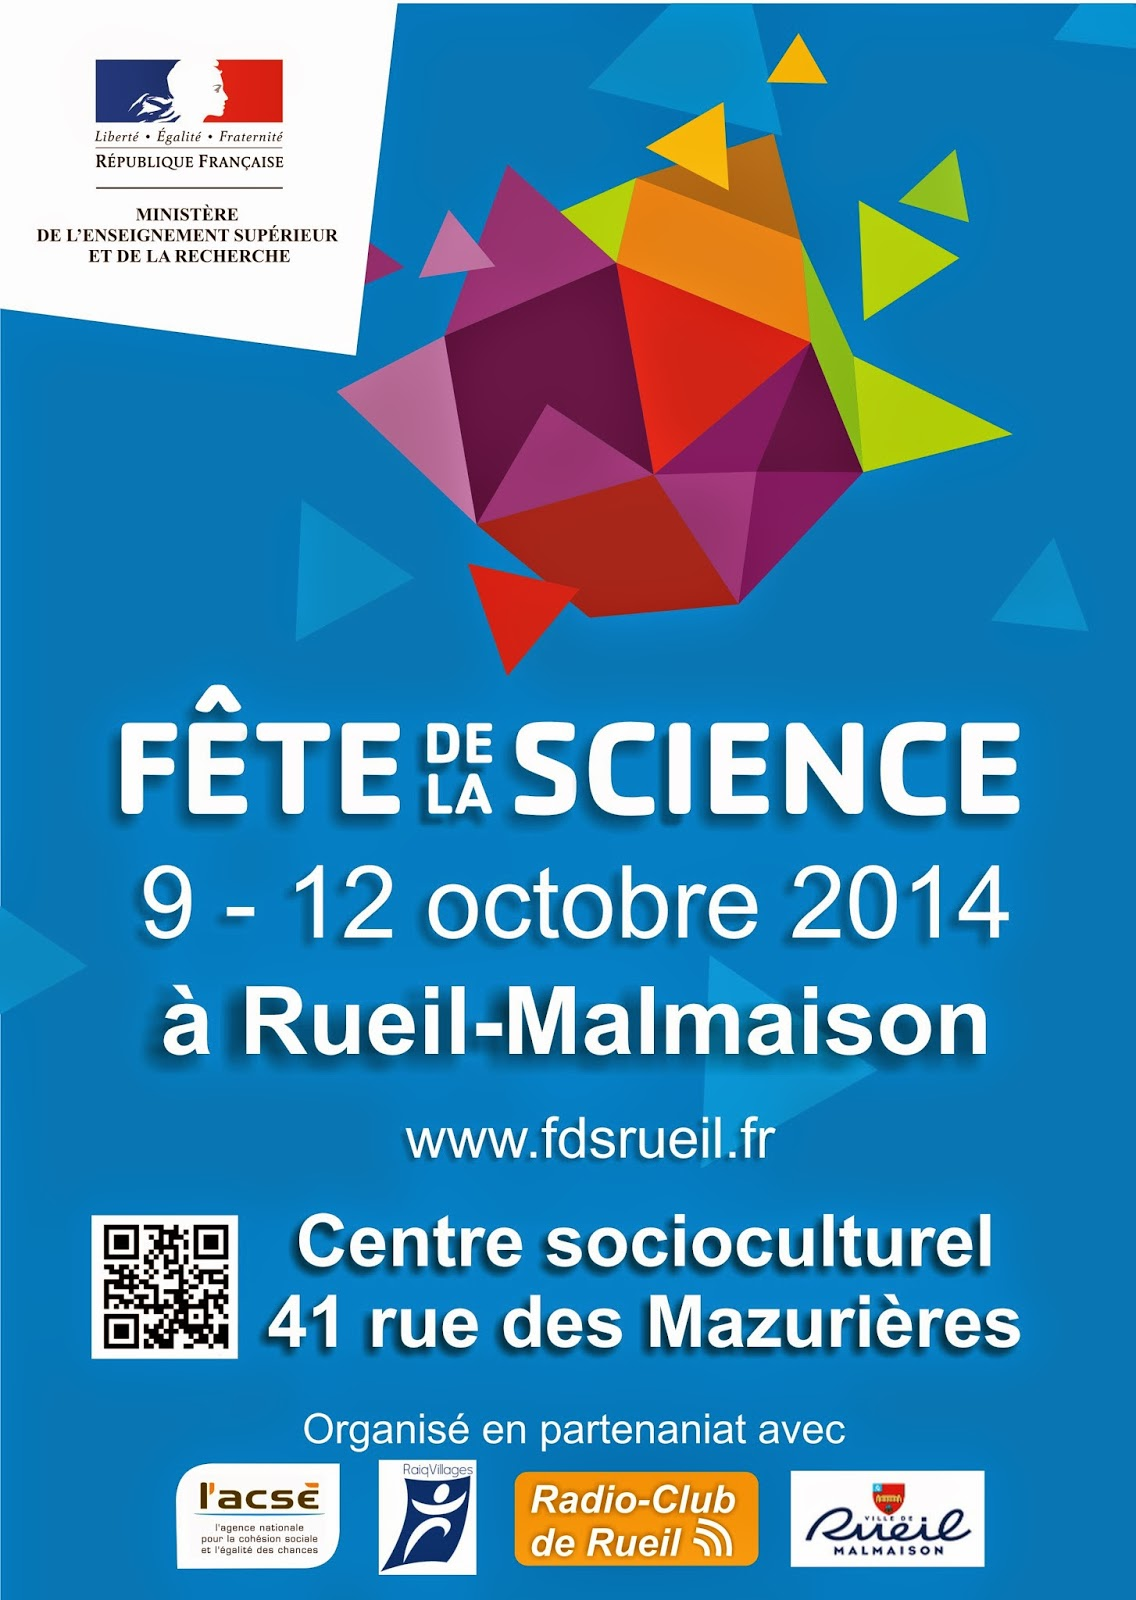 Physique chimie 2016 2017 2014 - Meteo rueil malmaison ...